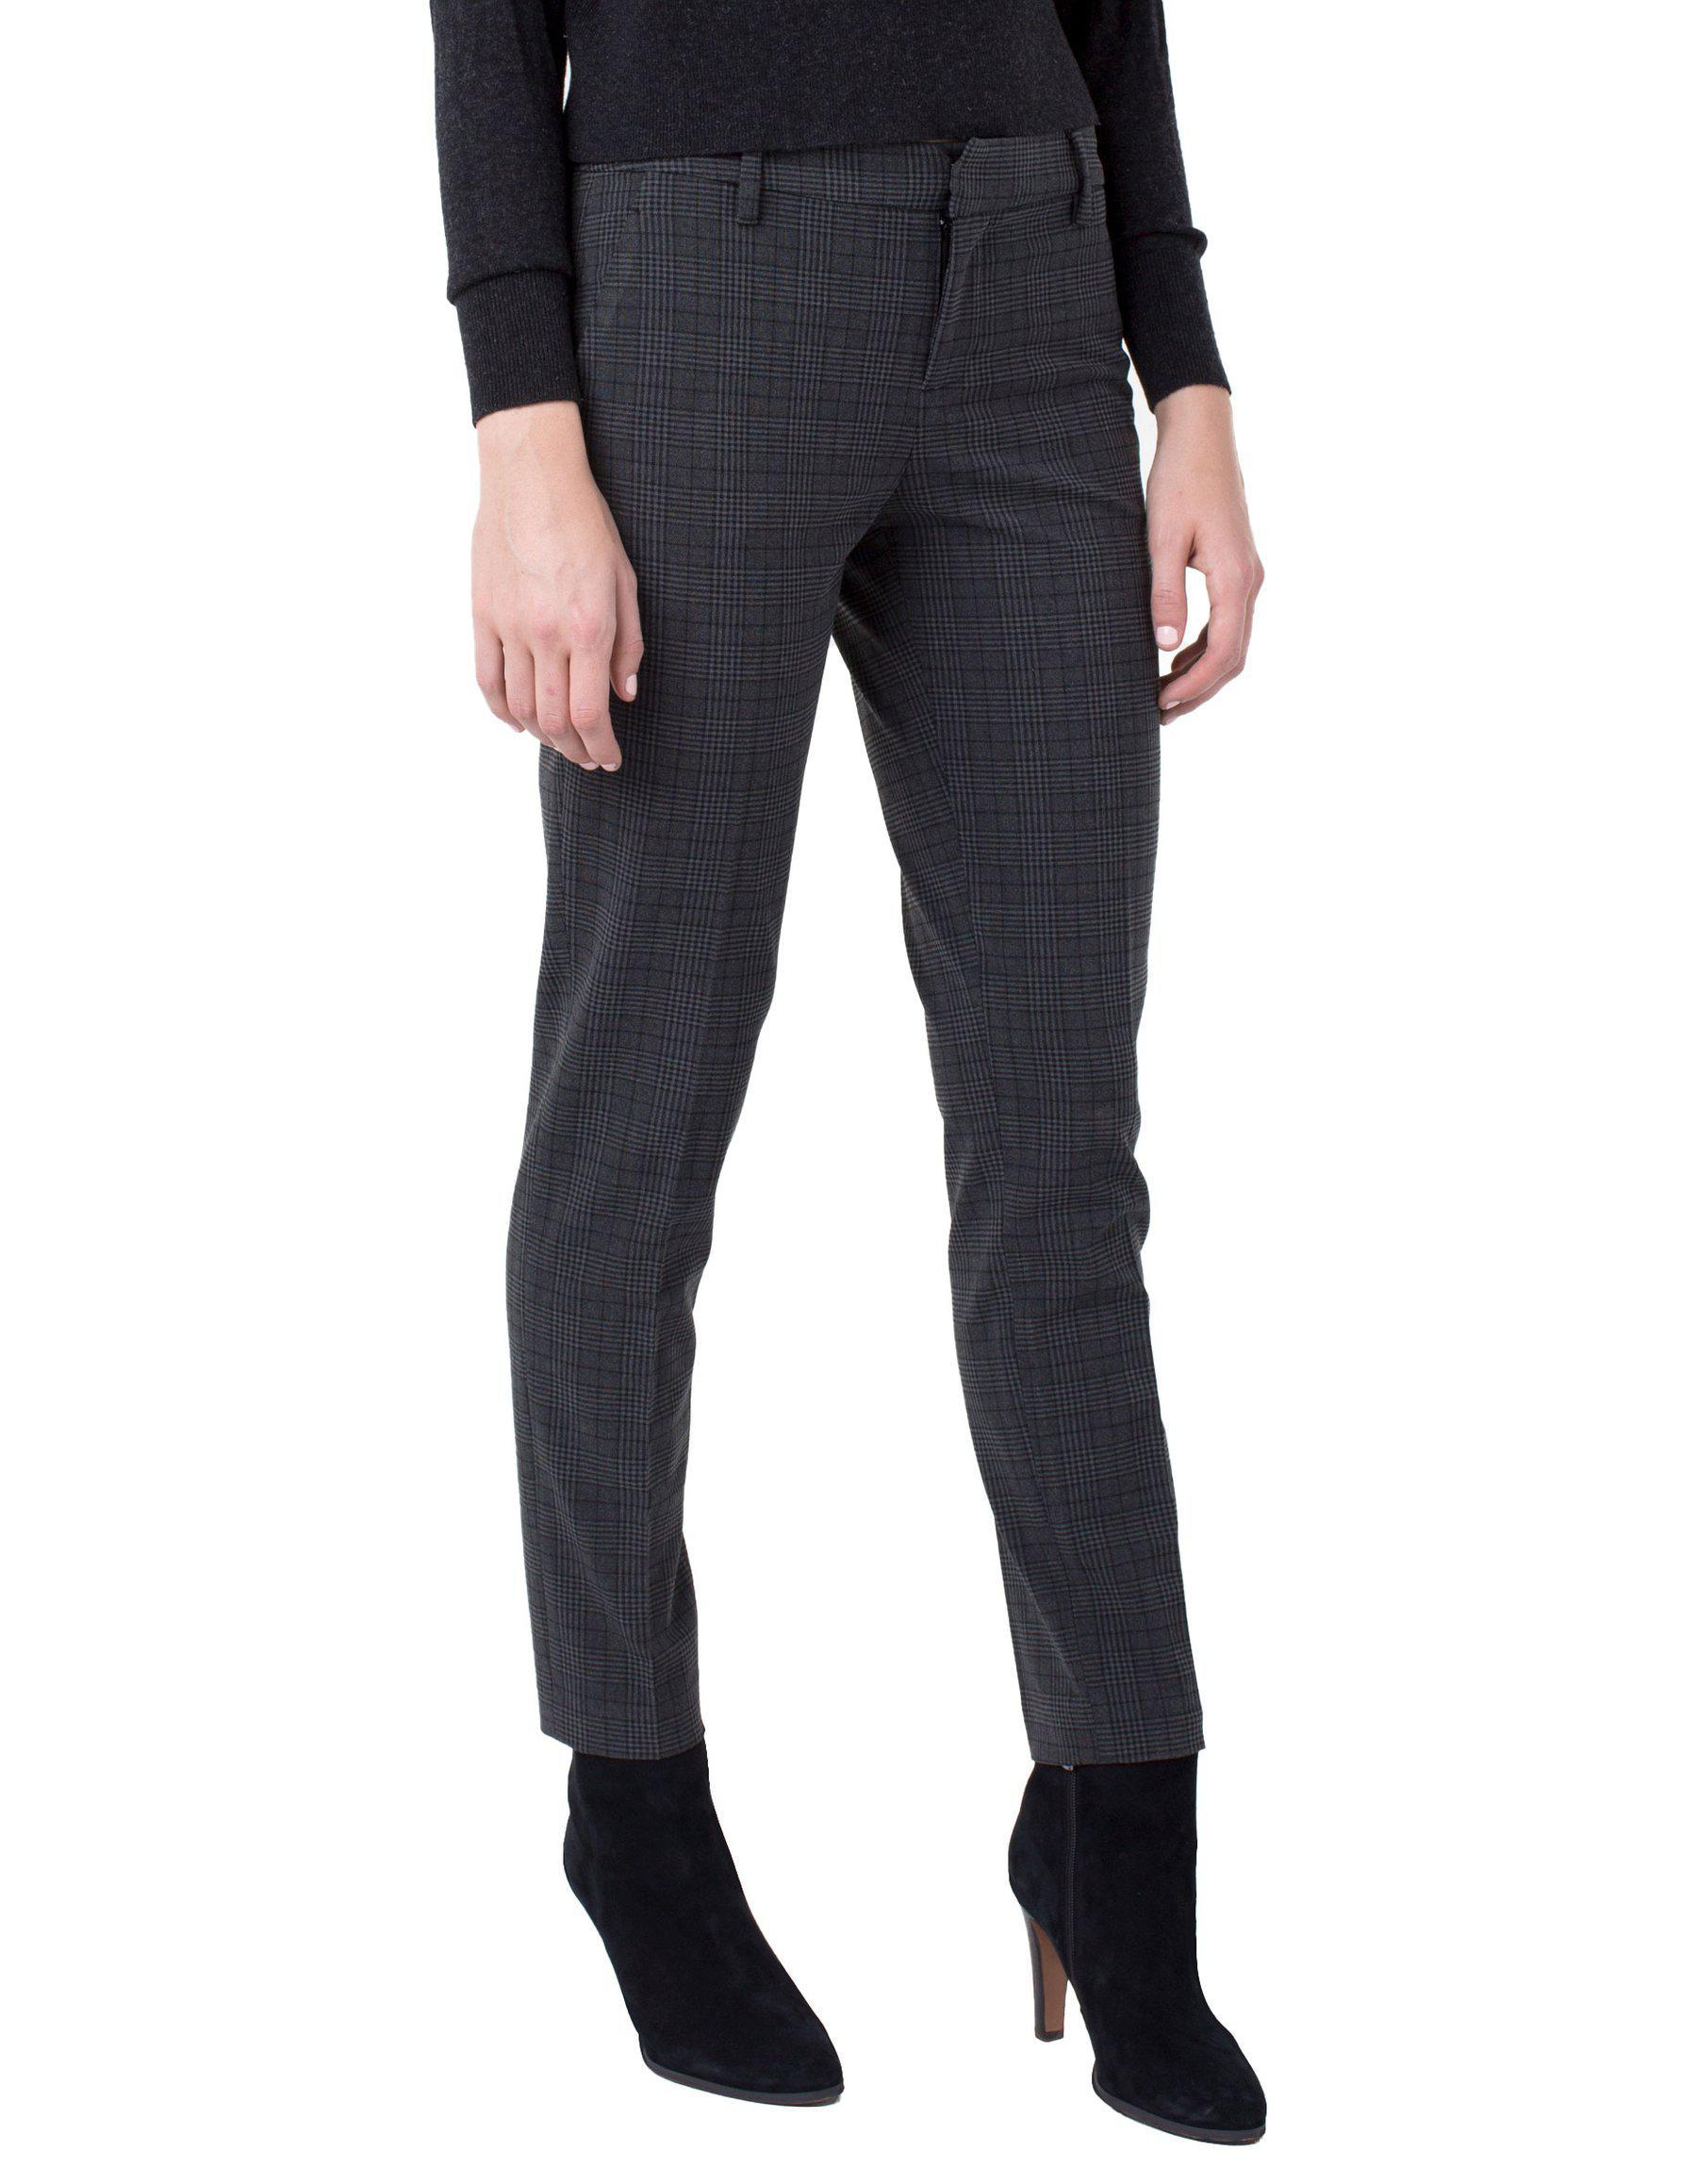 Lyst Liverpool Jeans Company Kelsey Trouser Patterned Knit In Black For Men